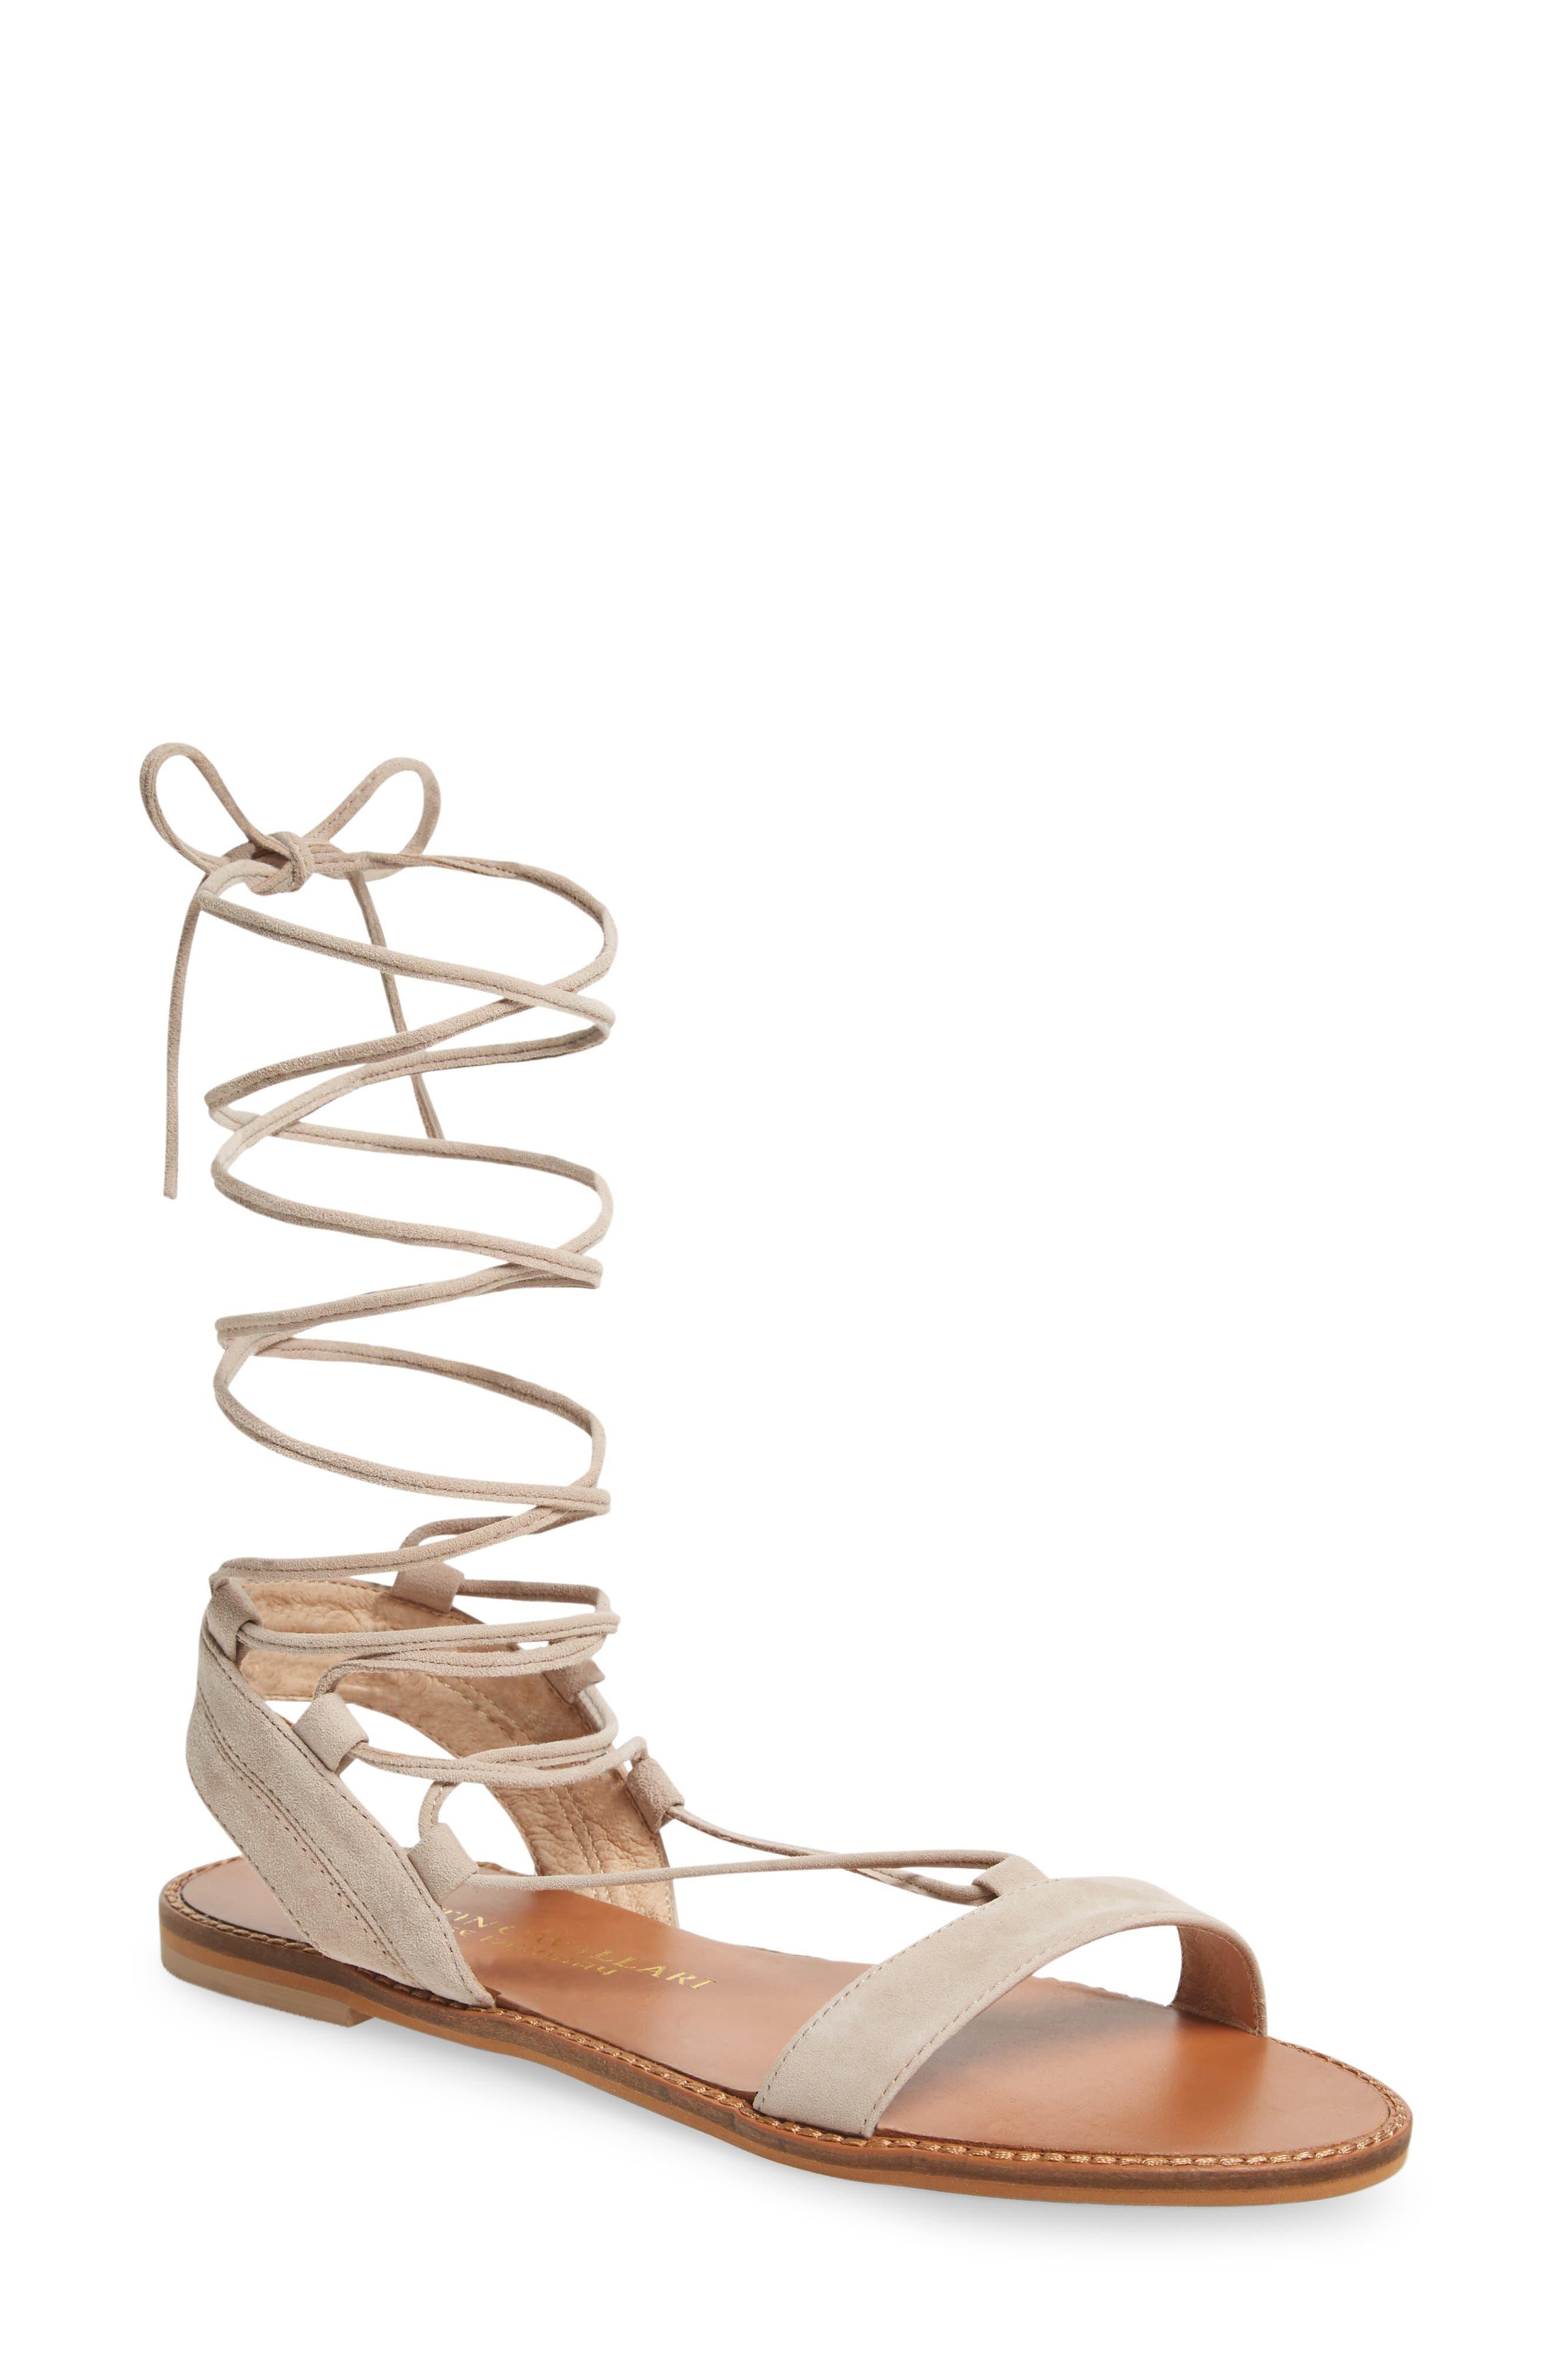 Brea Ankle Wrap Sandal,                             Main thumbnail 1, color,                             Mushroom